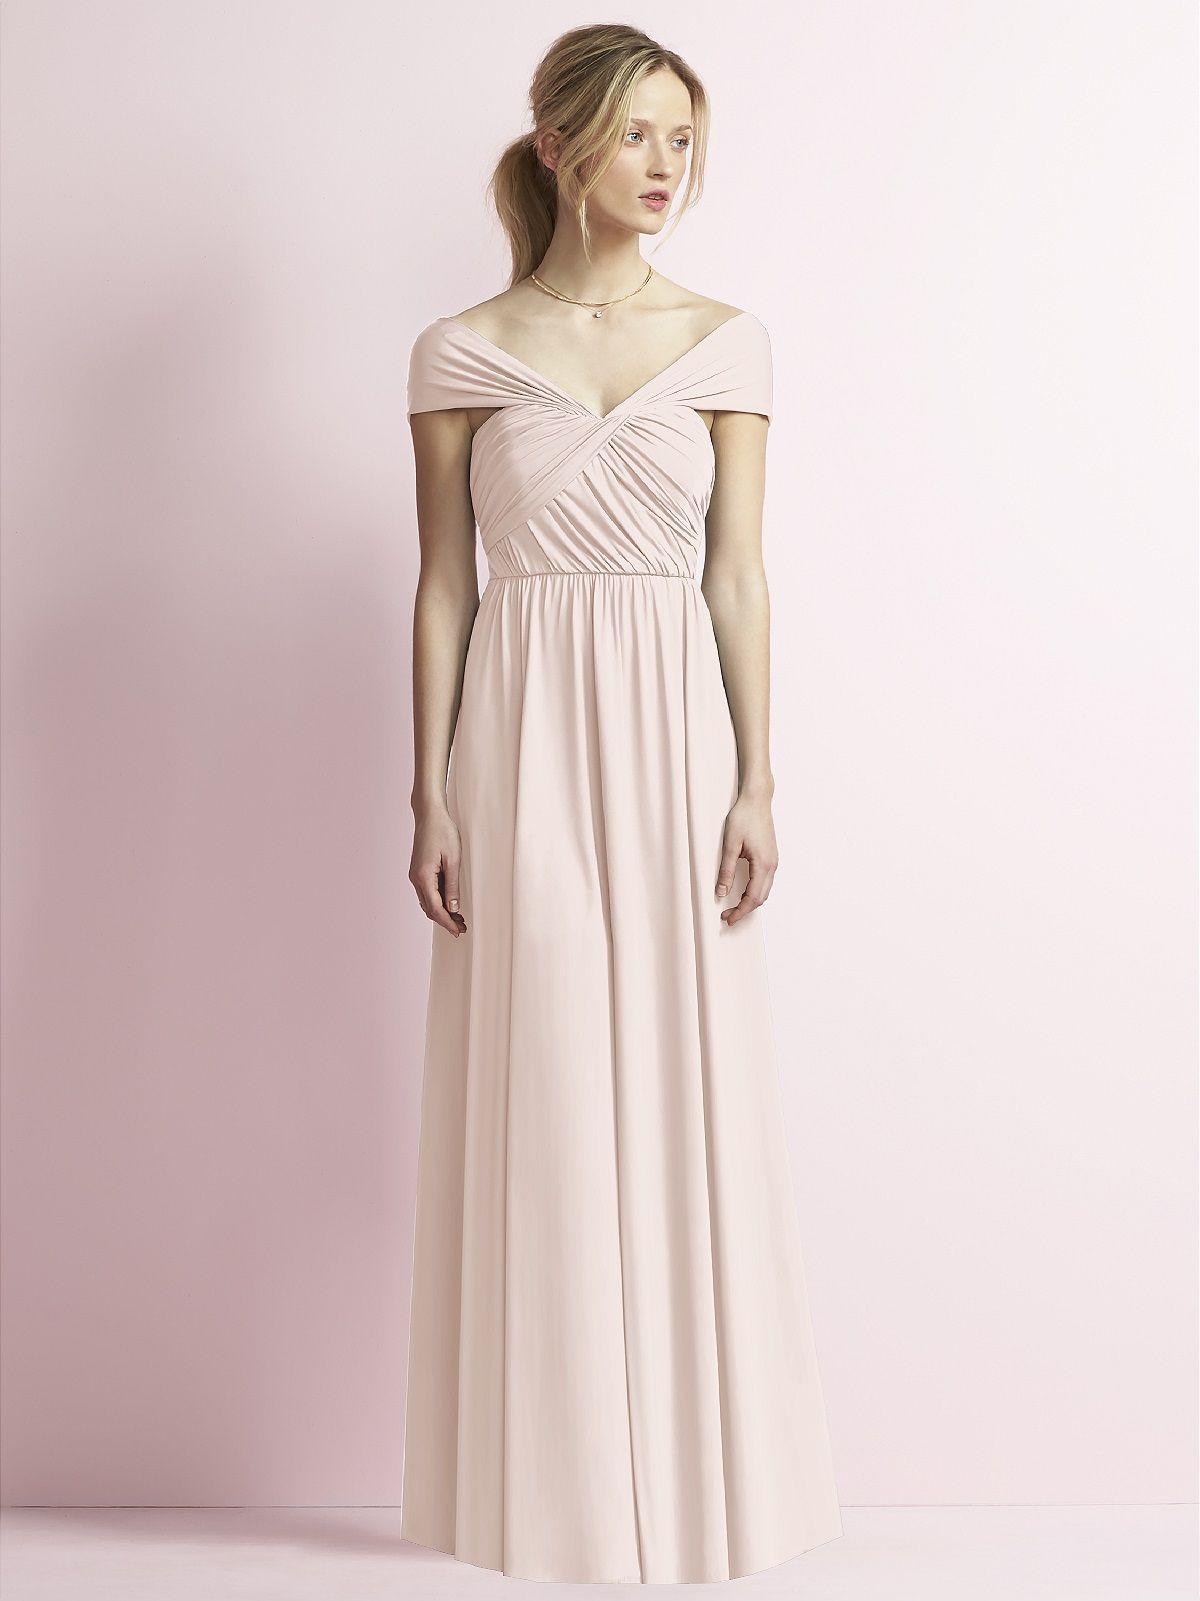 Jenny yoo jy jersey portrait neckline long aline bridesmaid